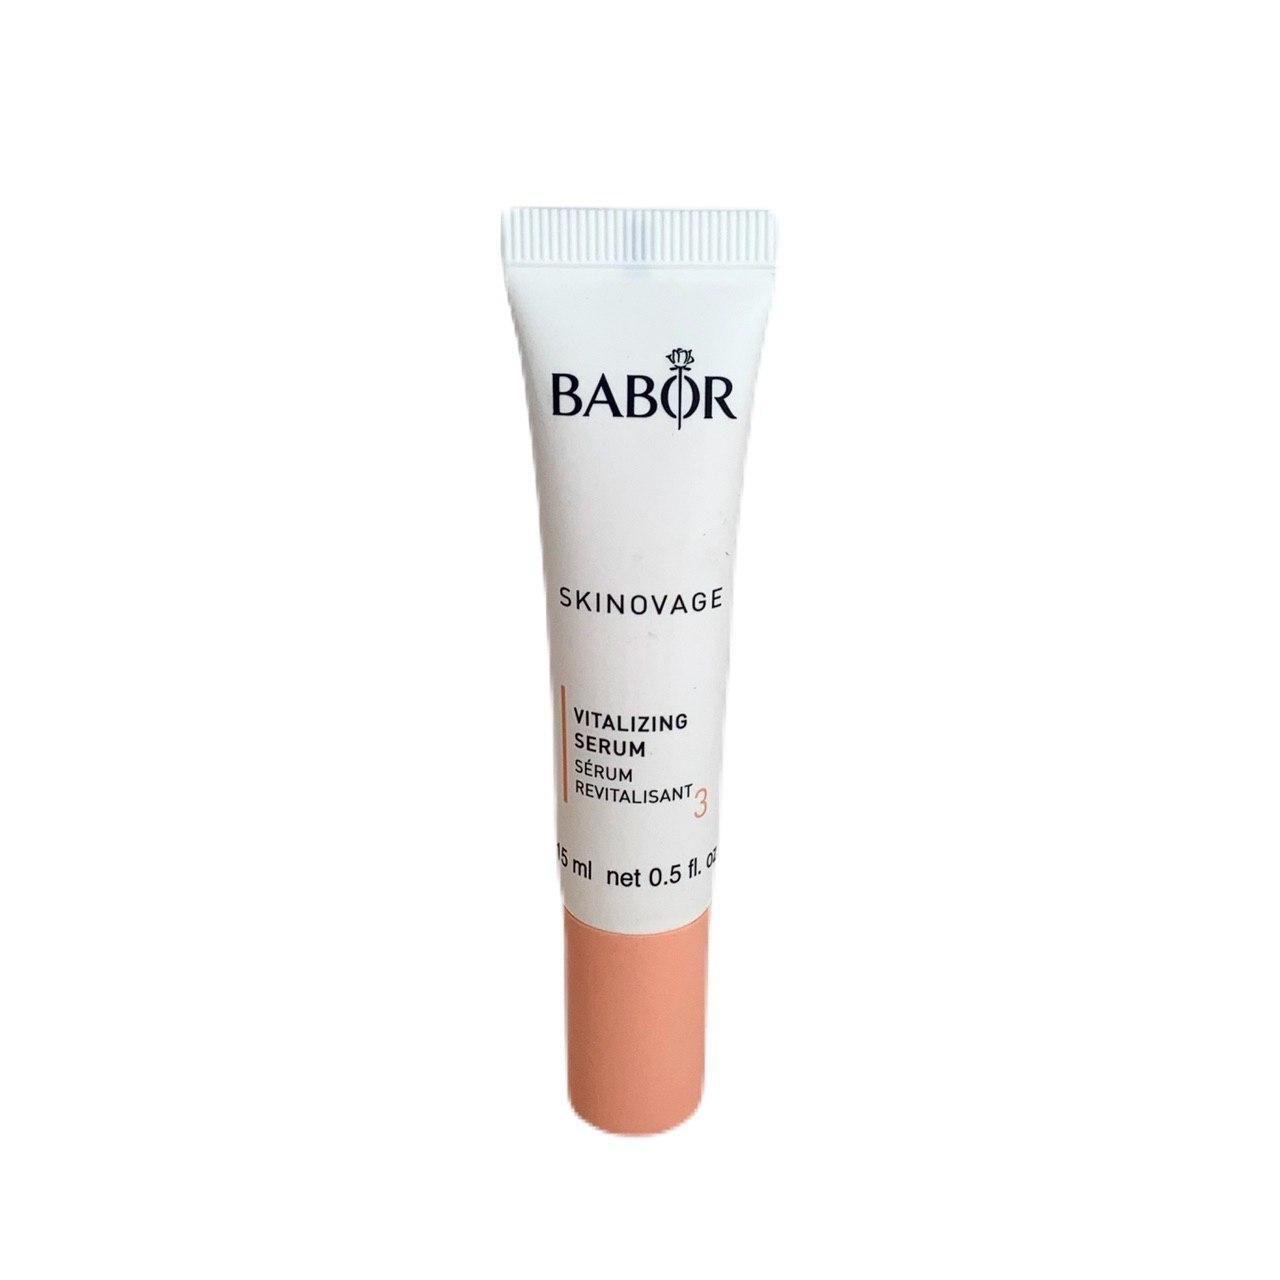 Сыворотка для лица Babor Skinovage Vitalizing Serum MINI 15 мл